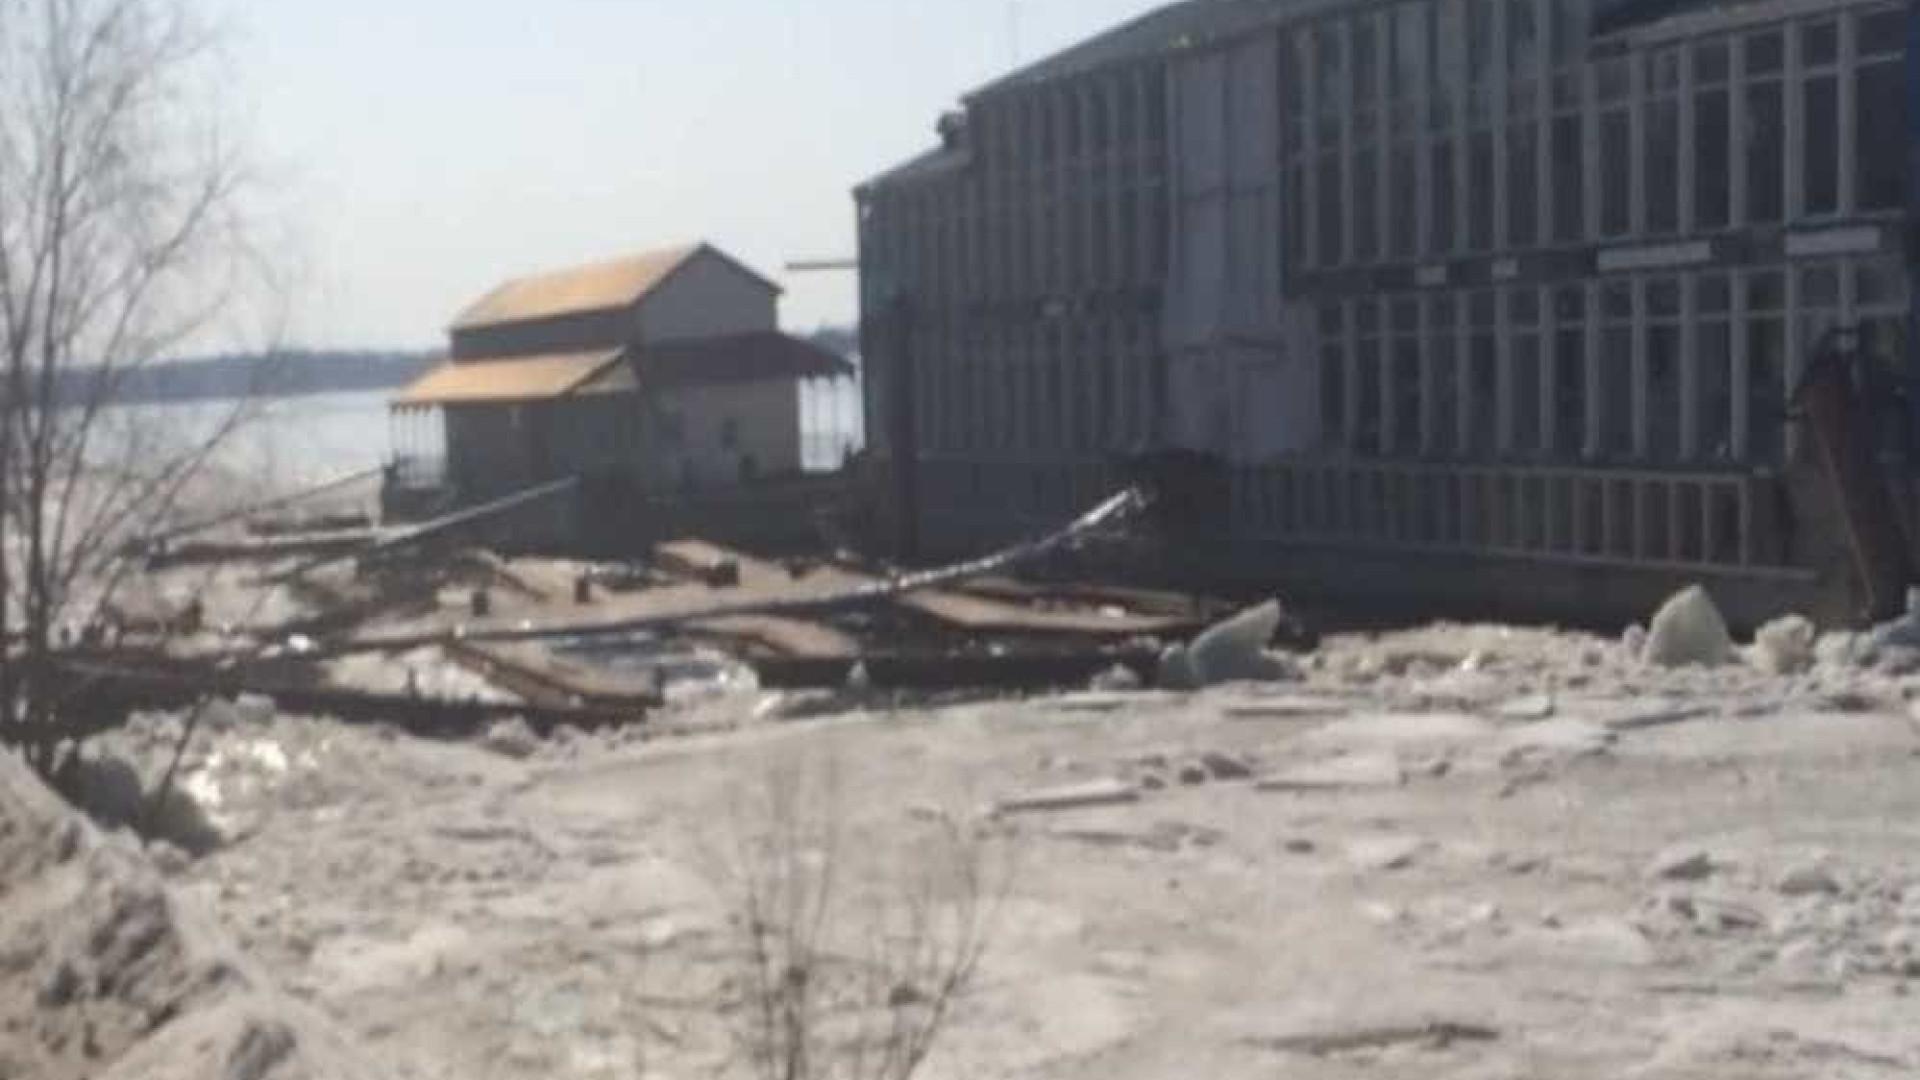 Gelo derretido arrasta restaurante na Rússia